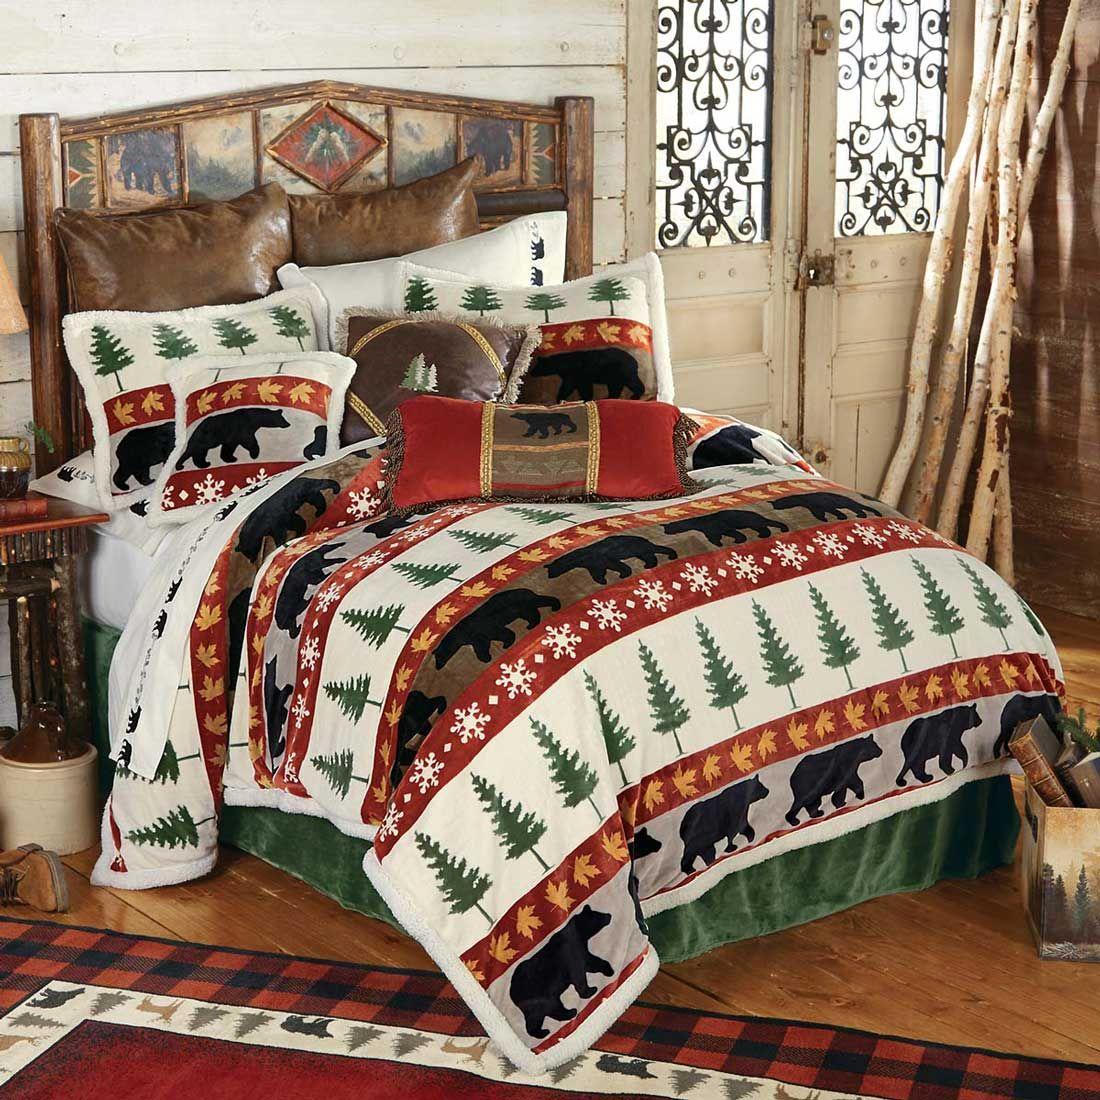 Cabin Bedspread Bear Adventure Fleece Bedding Set Cabin Bed Rustic Bedding Black Forest Decor